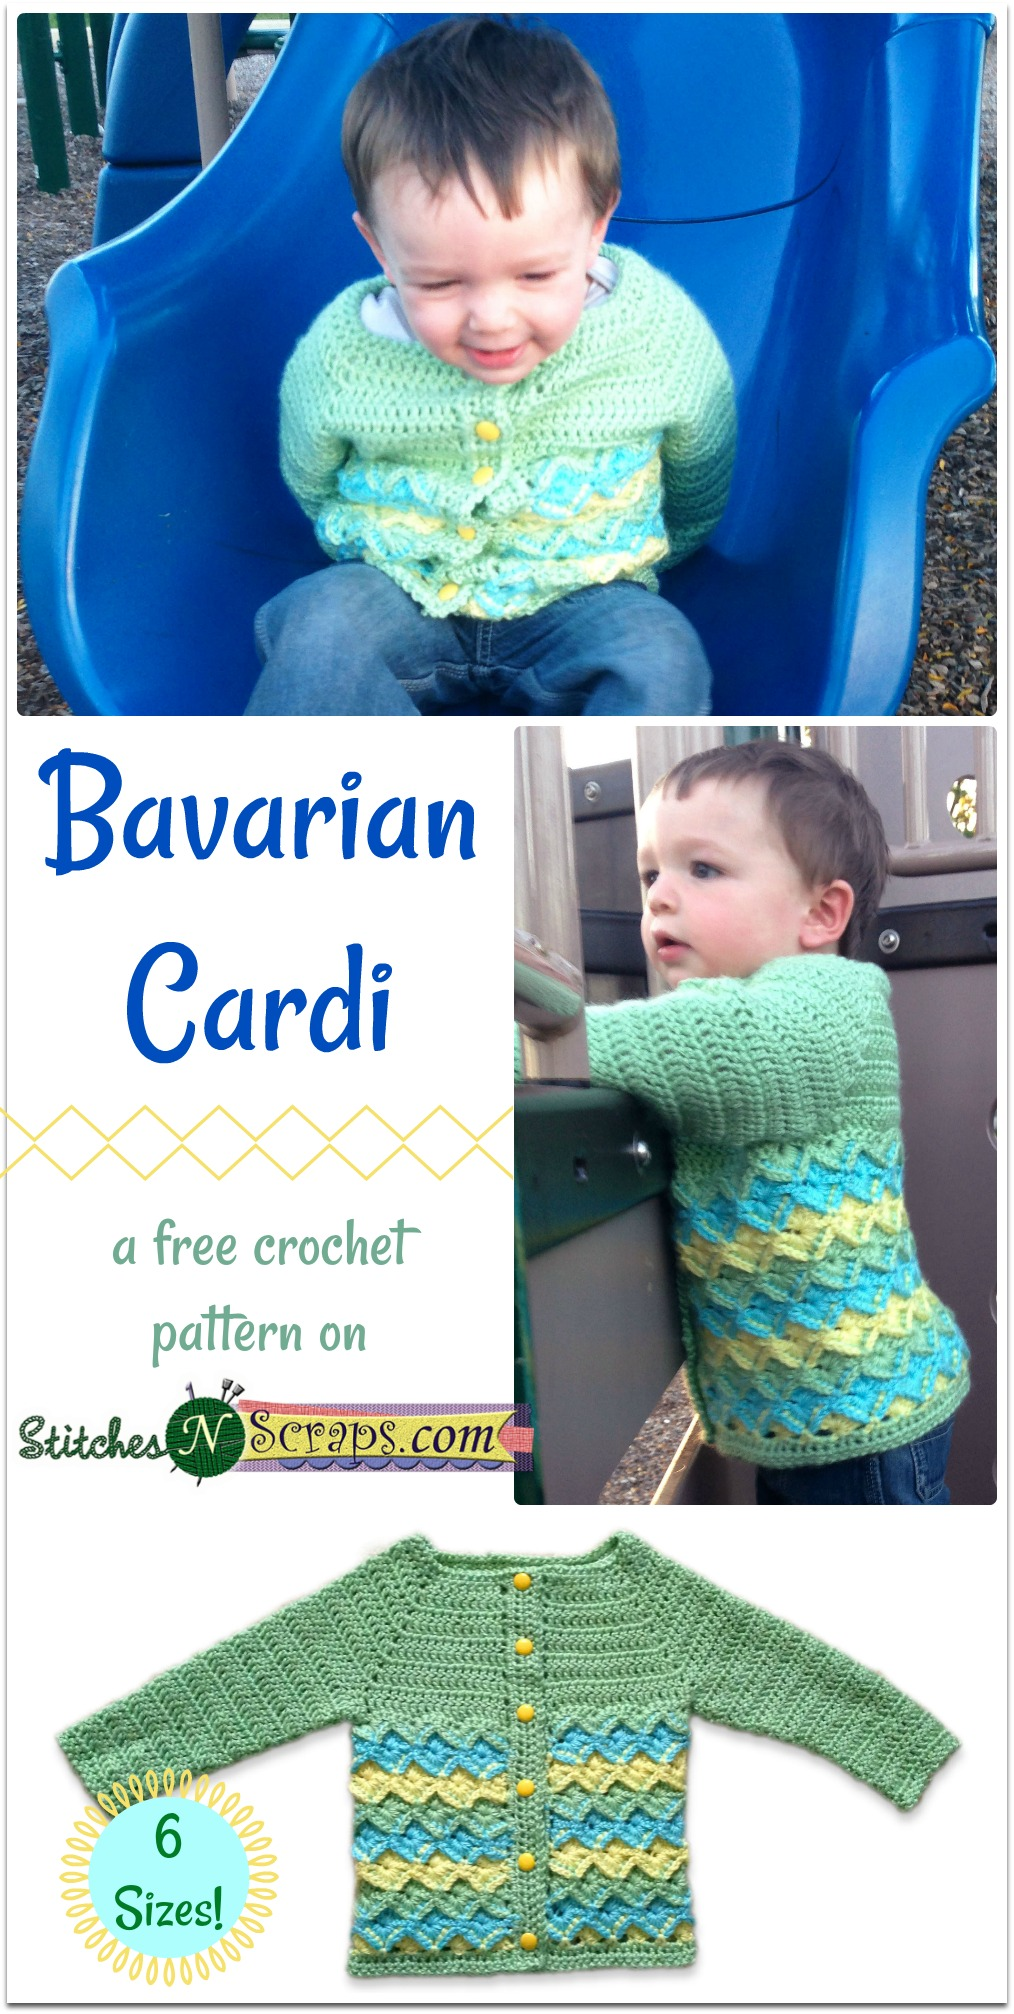 Free Pattern - Bavarian Cardi - Stitches n Scraps